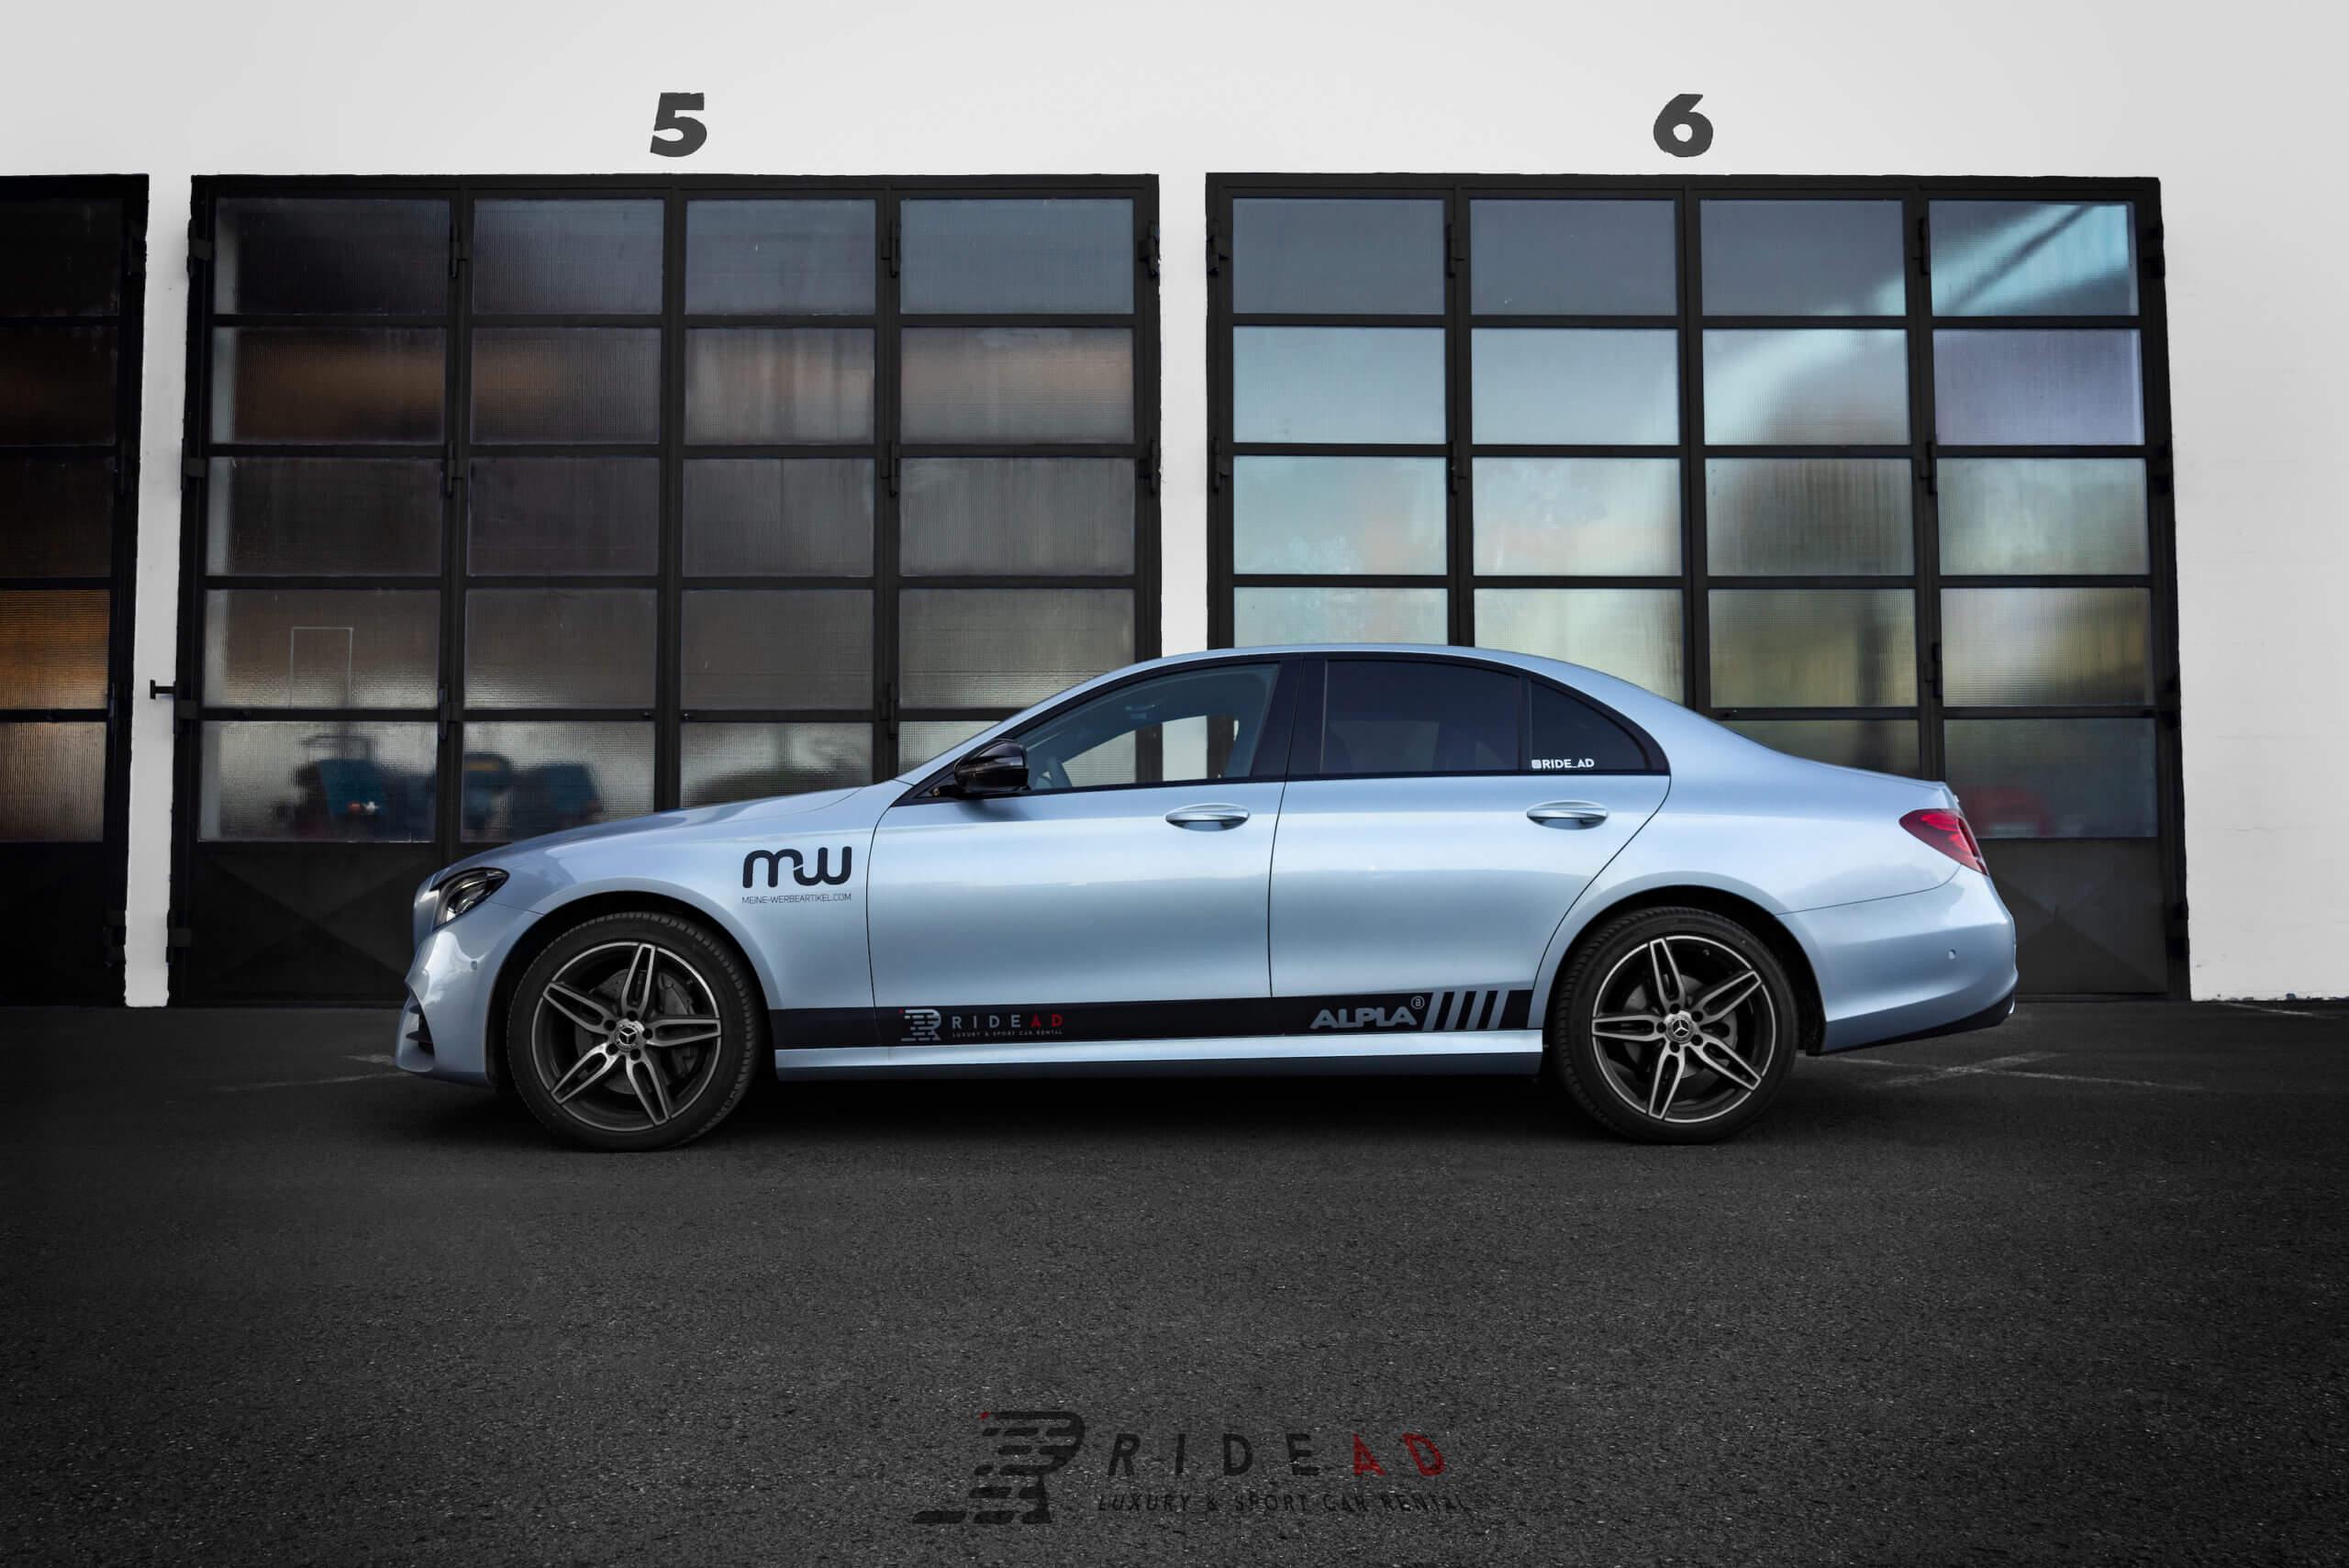 Ride Ad Luxury and Sports Car Rental - Mercedes-Benz E220d Kurzzeitmiete 3